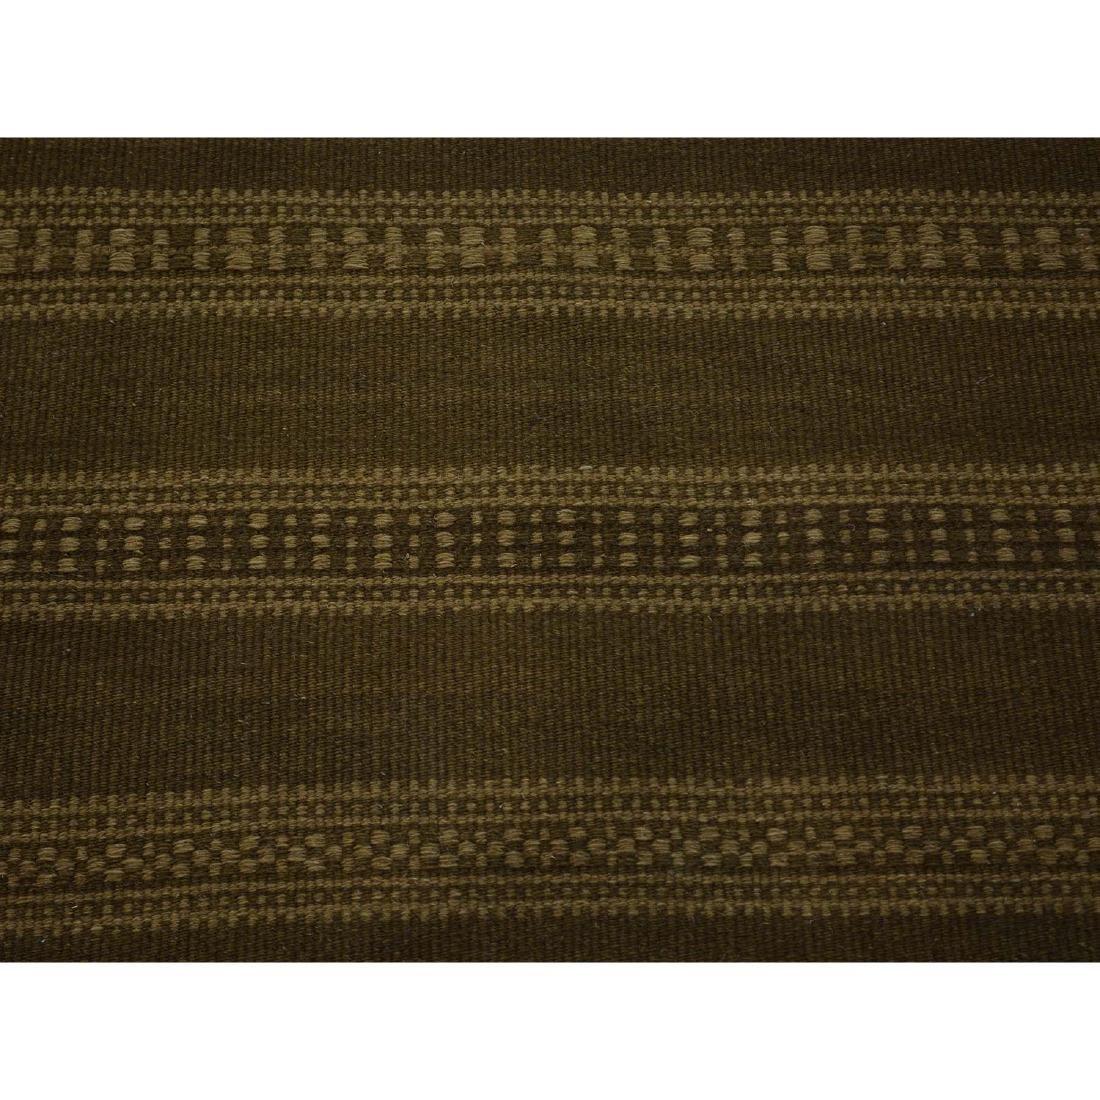 Wool Durie Kilim Rug Hand Woven Flat Weave 3x5.1 - 3